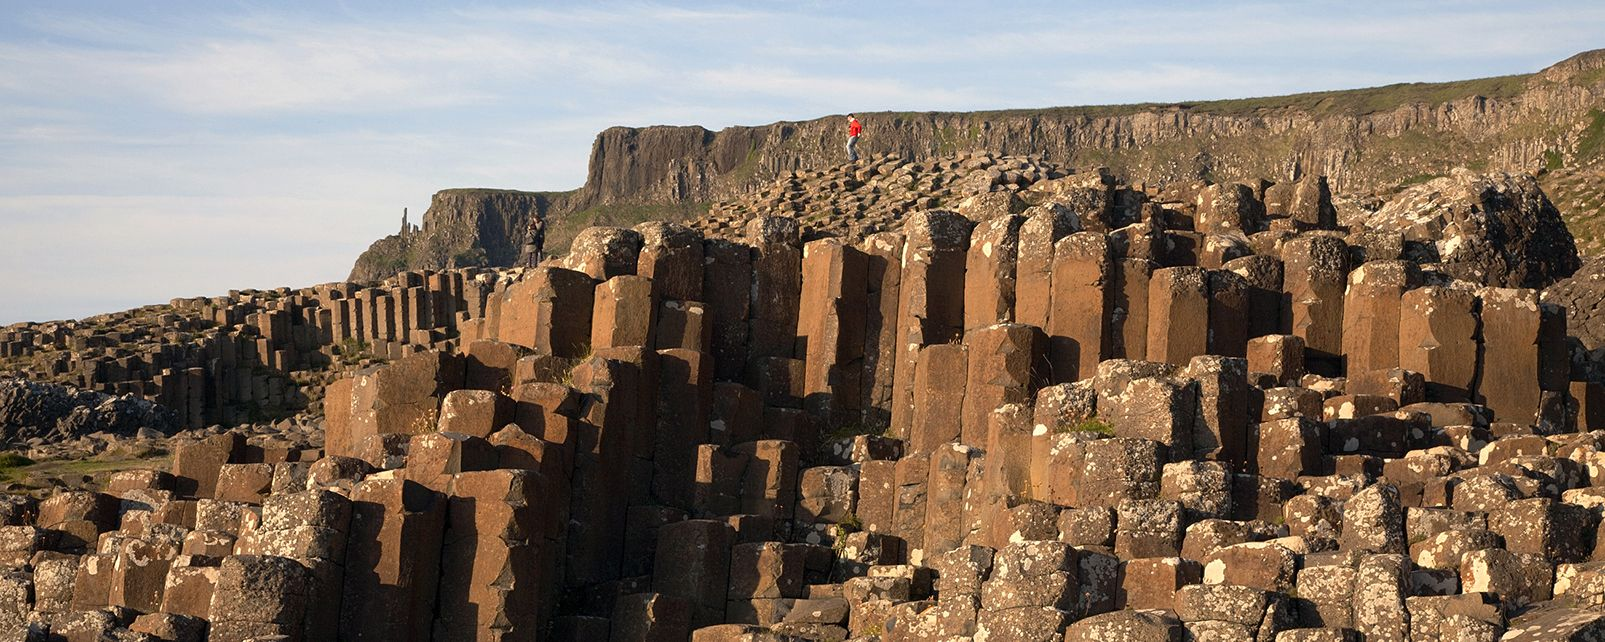 La Chaussée des Géants , La Chaussée des Géants en Irlande du Nord , Royaume-Uni